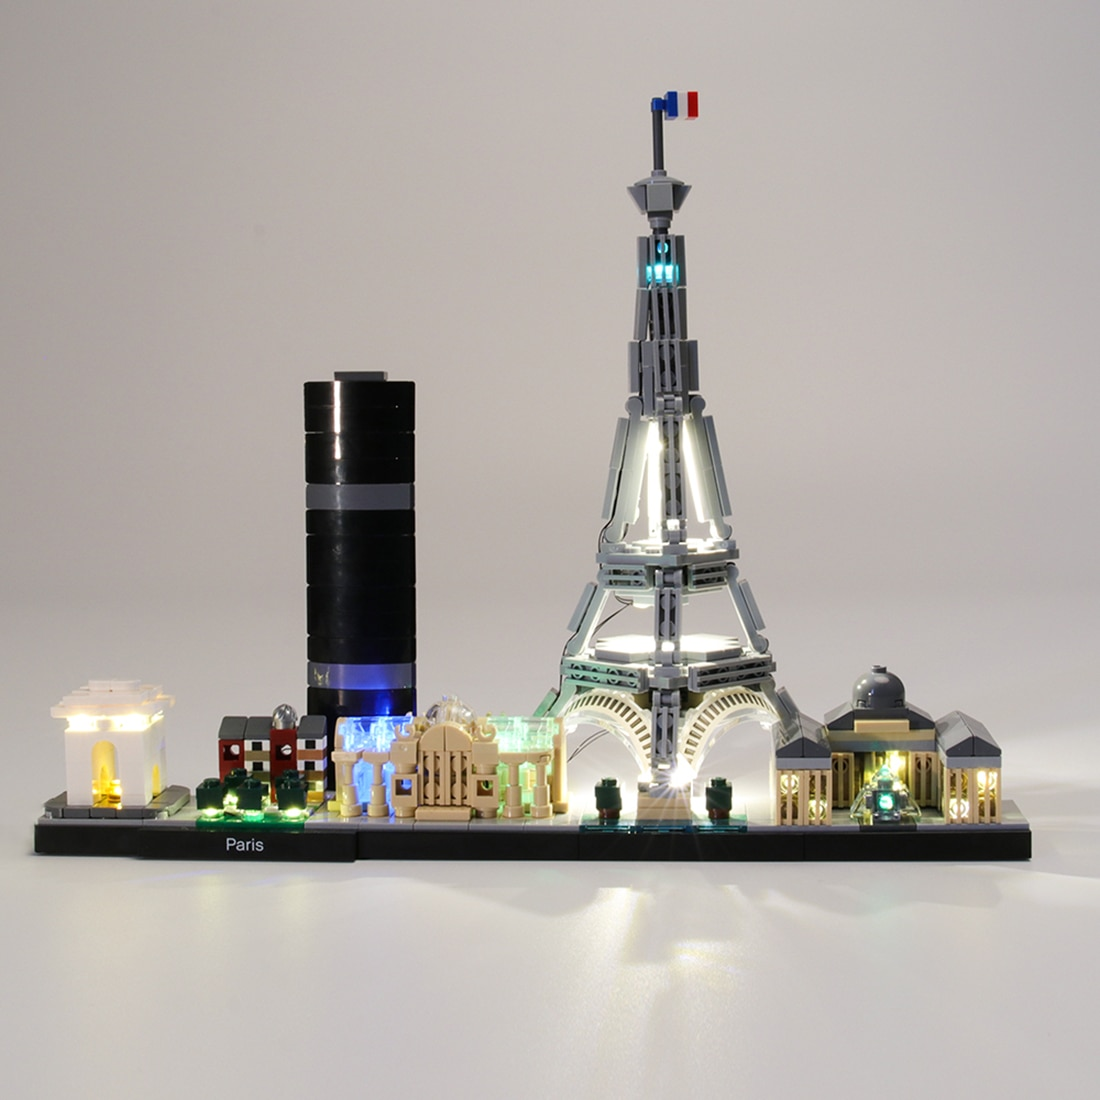 Kit de iluminación USB para arquitectura Paris 21044 (solo luz LED, sin Kit de bloqueo)